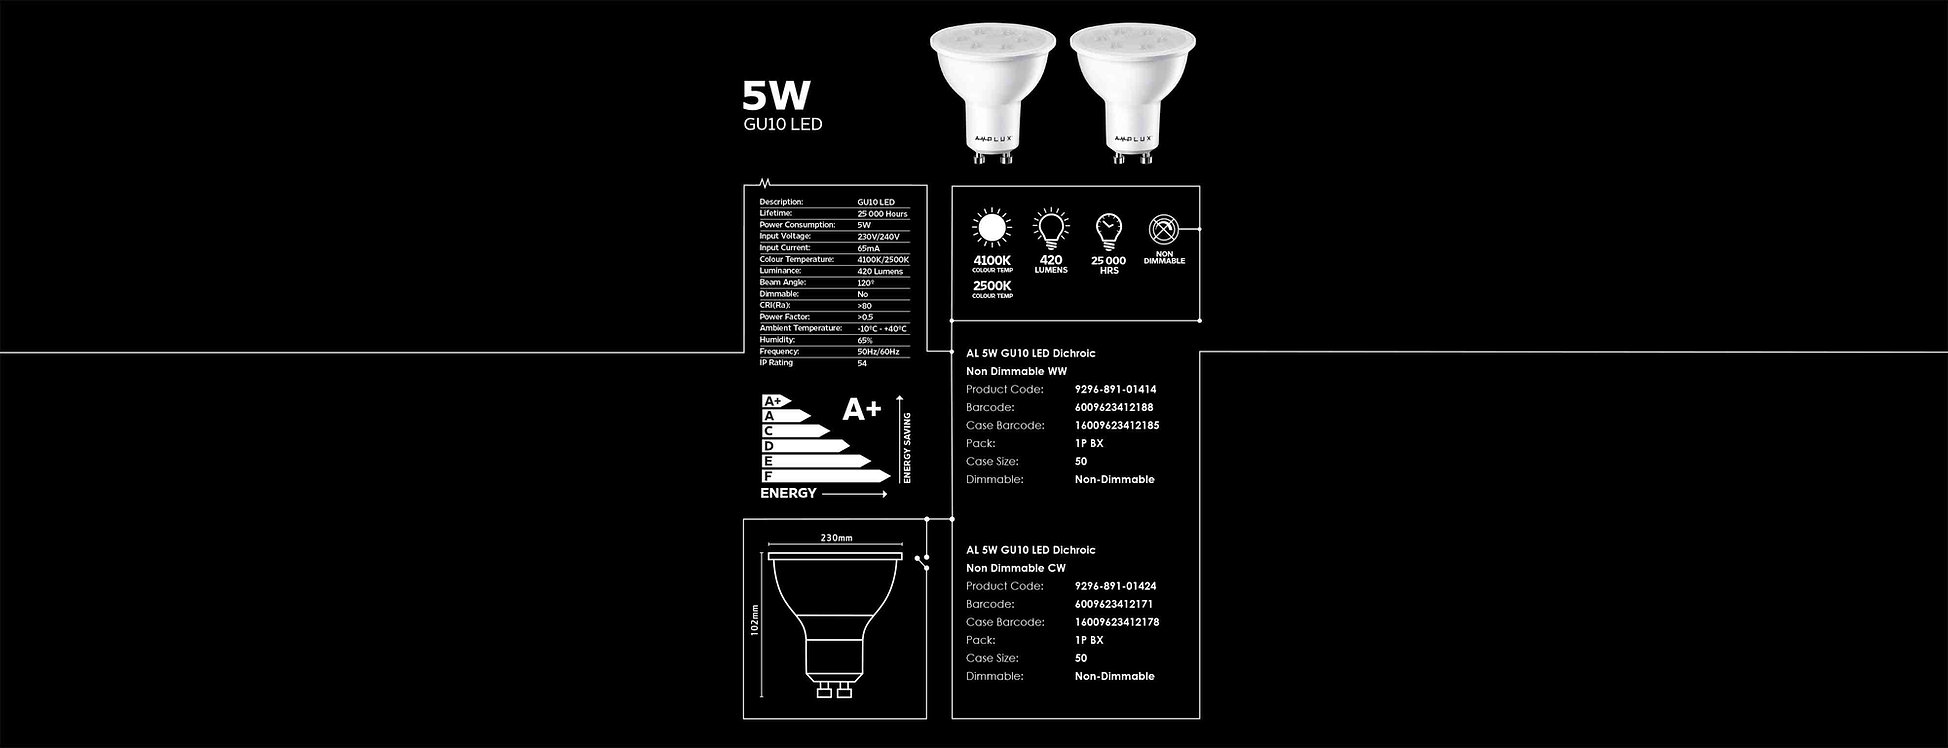 amplux LED gu10 bulb.jpg